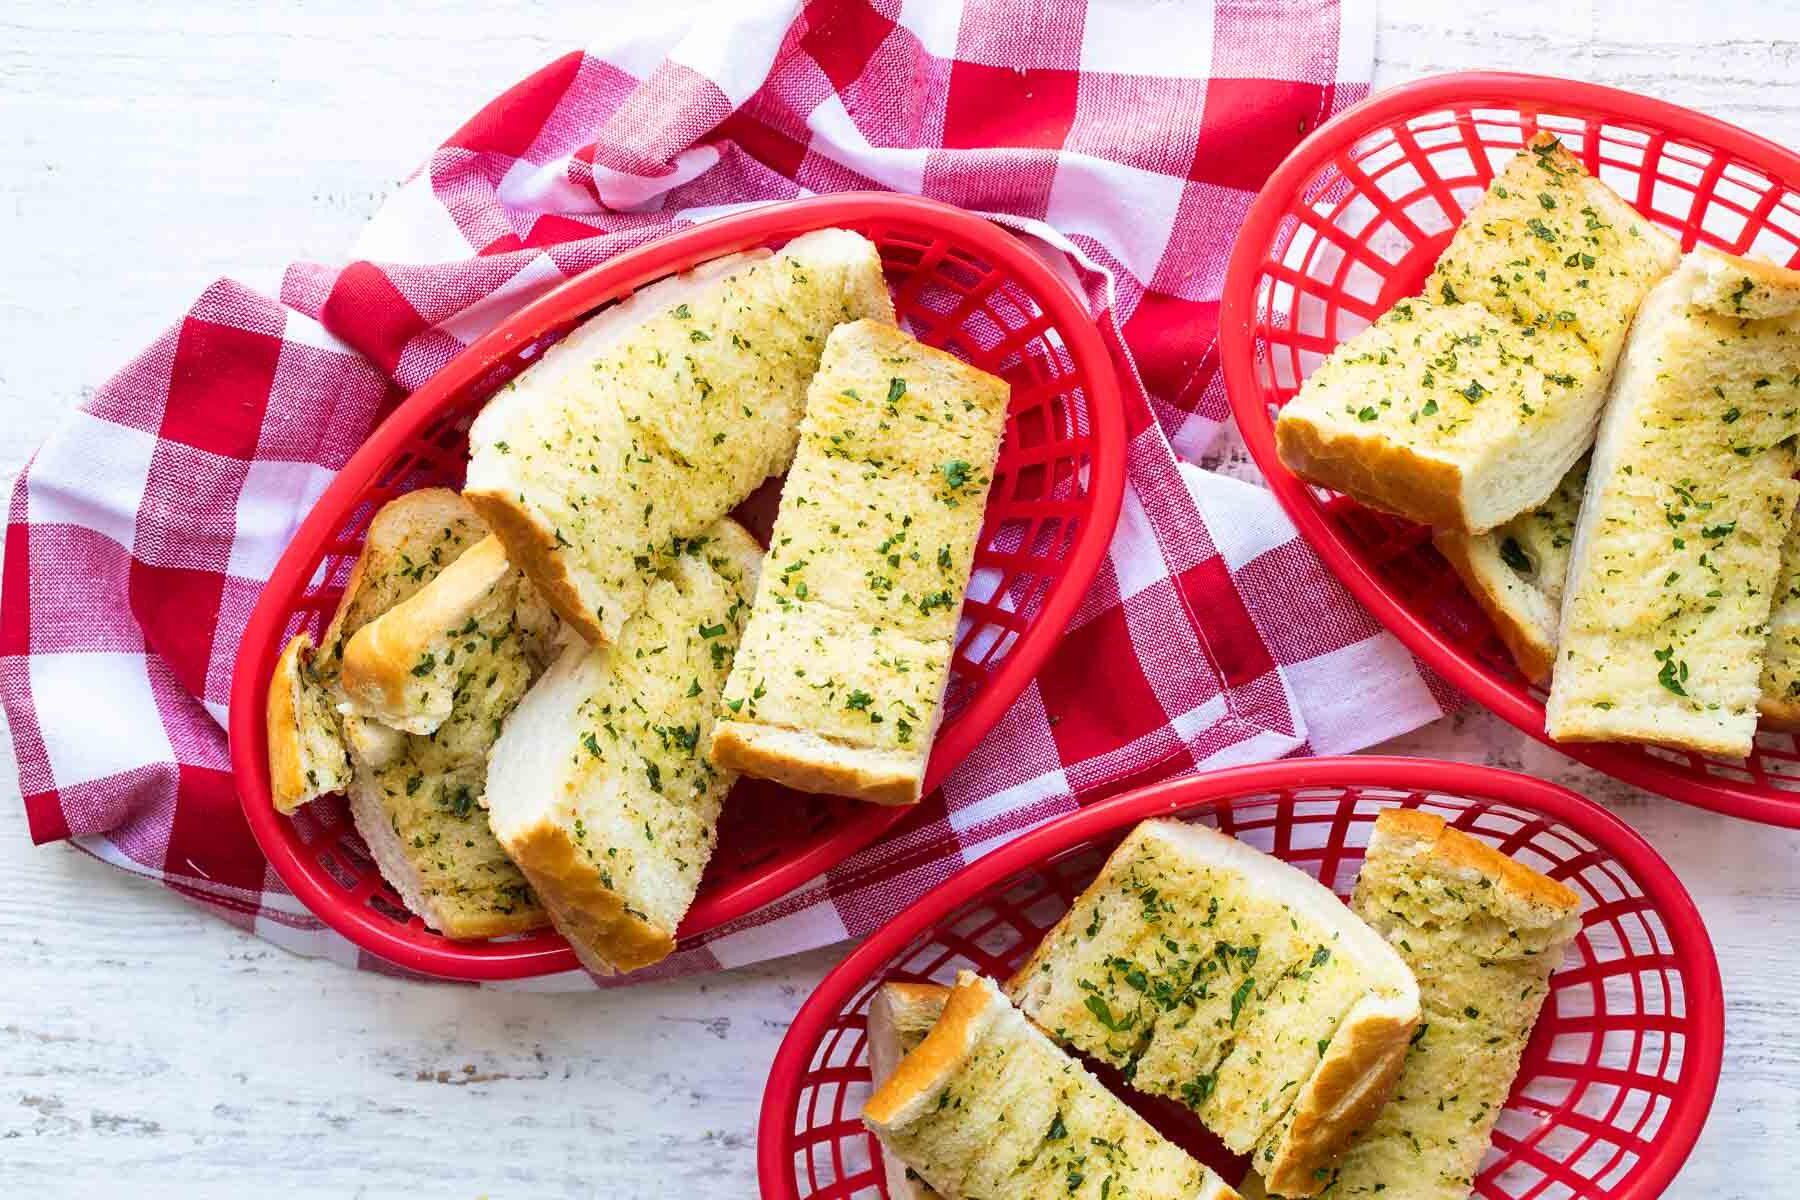 Garlic bread in three plastic red baskets.